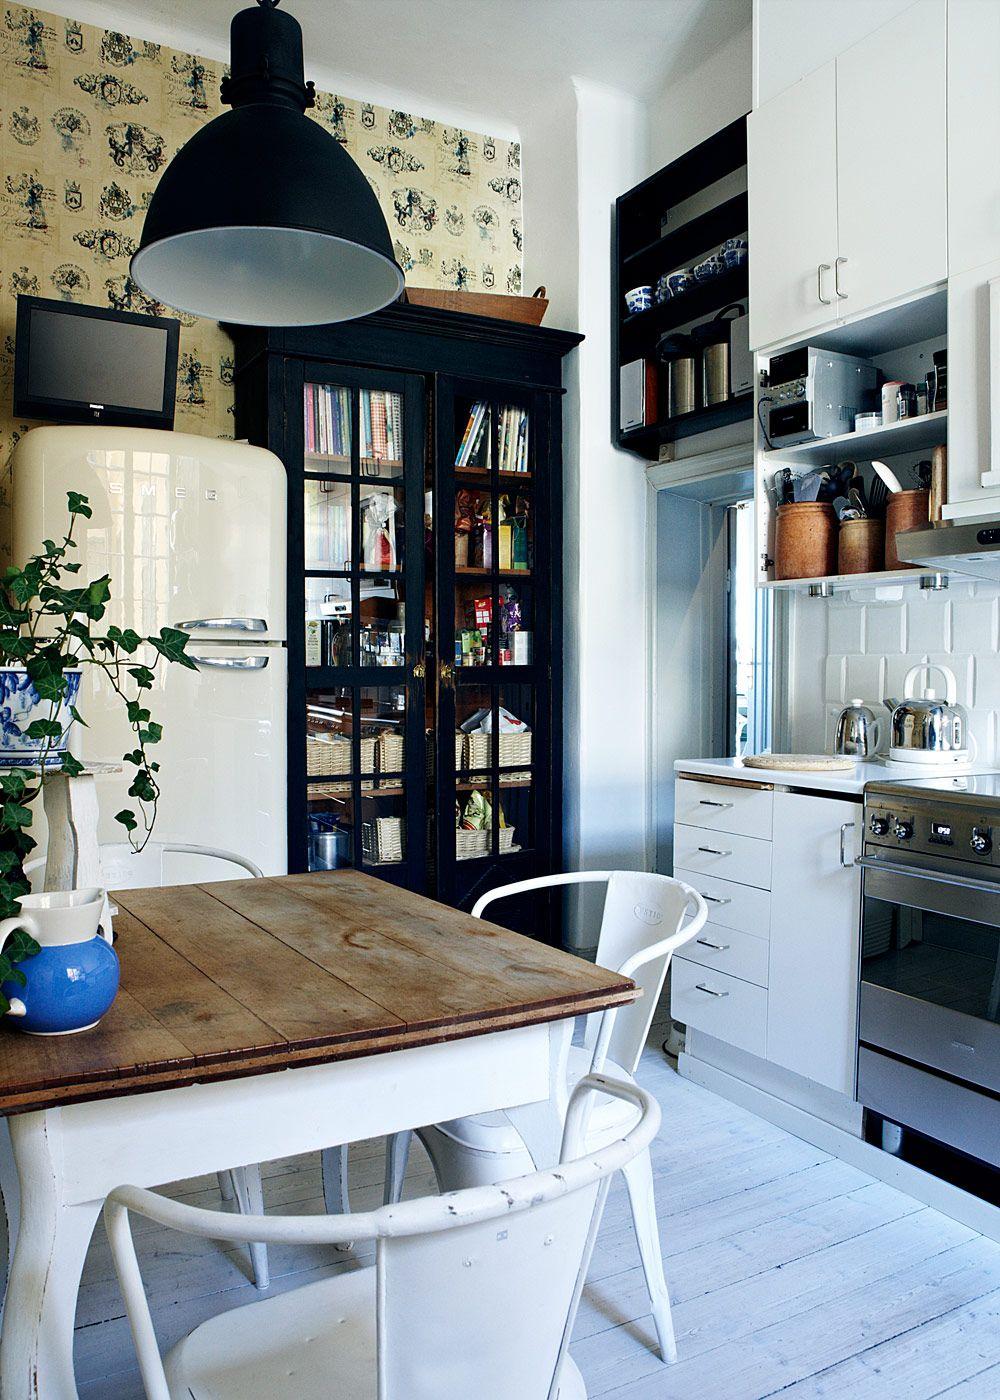 Cozy Kitchen Heminredning Kok Koksdesigner Sweet Home